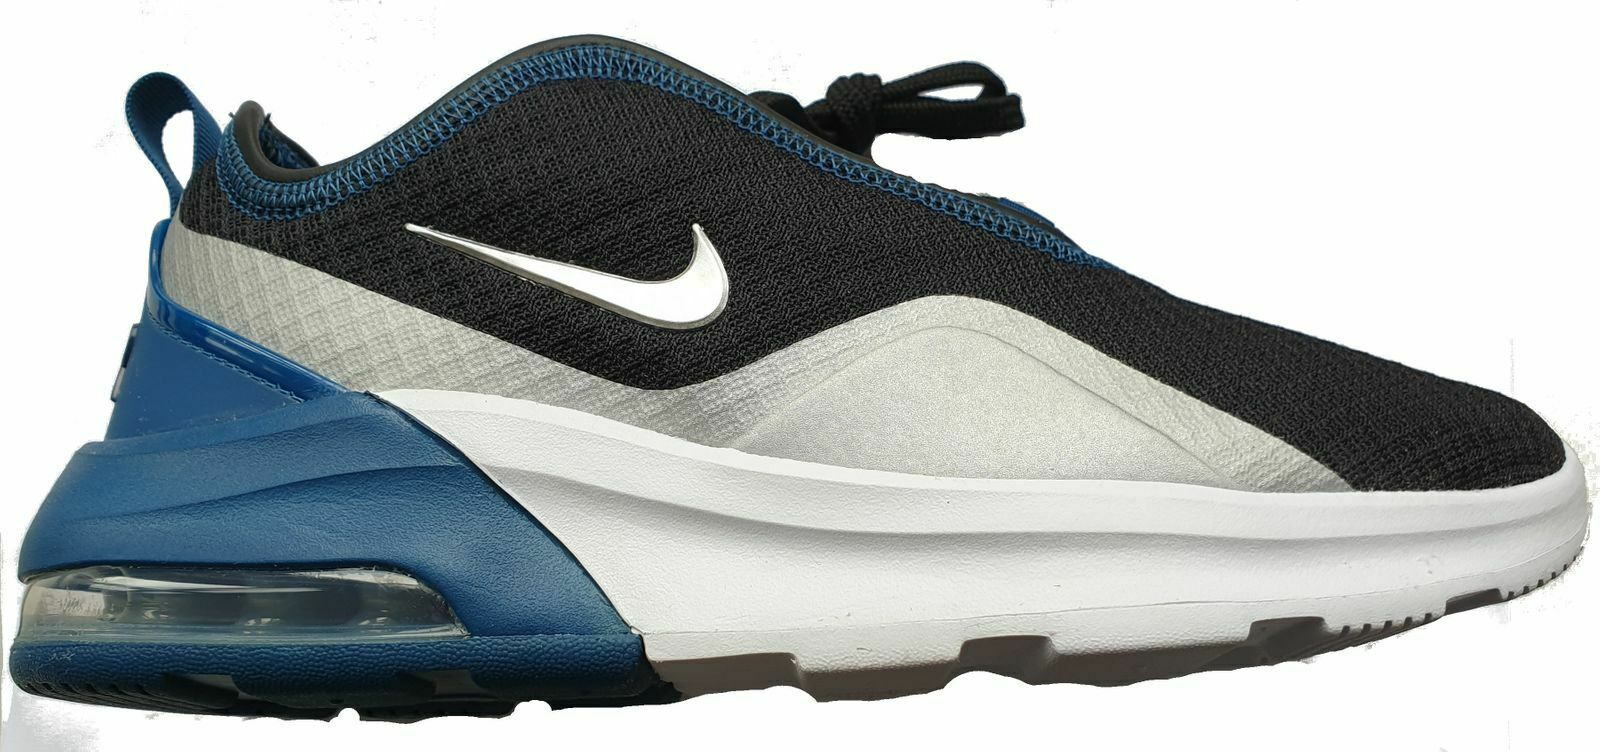 Nike Damen-Fitness-Sport-Freizet-Schuhe Top WMNS AIR MAX MOTION 2 schwarz blau